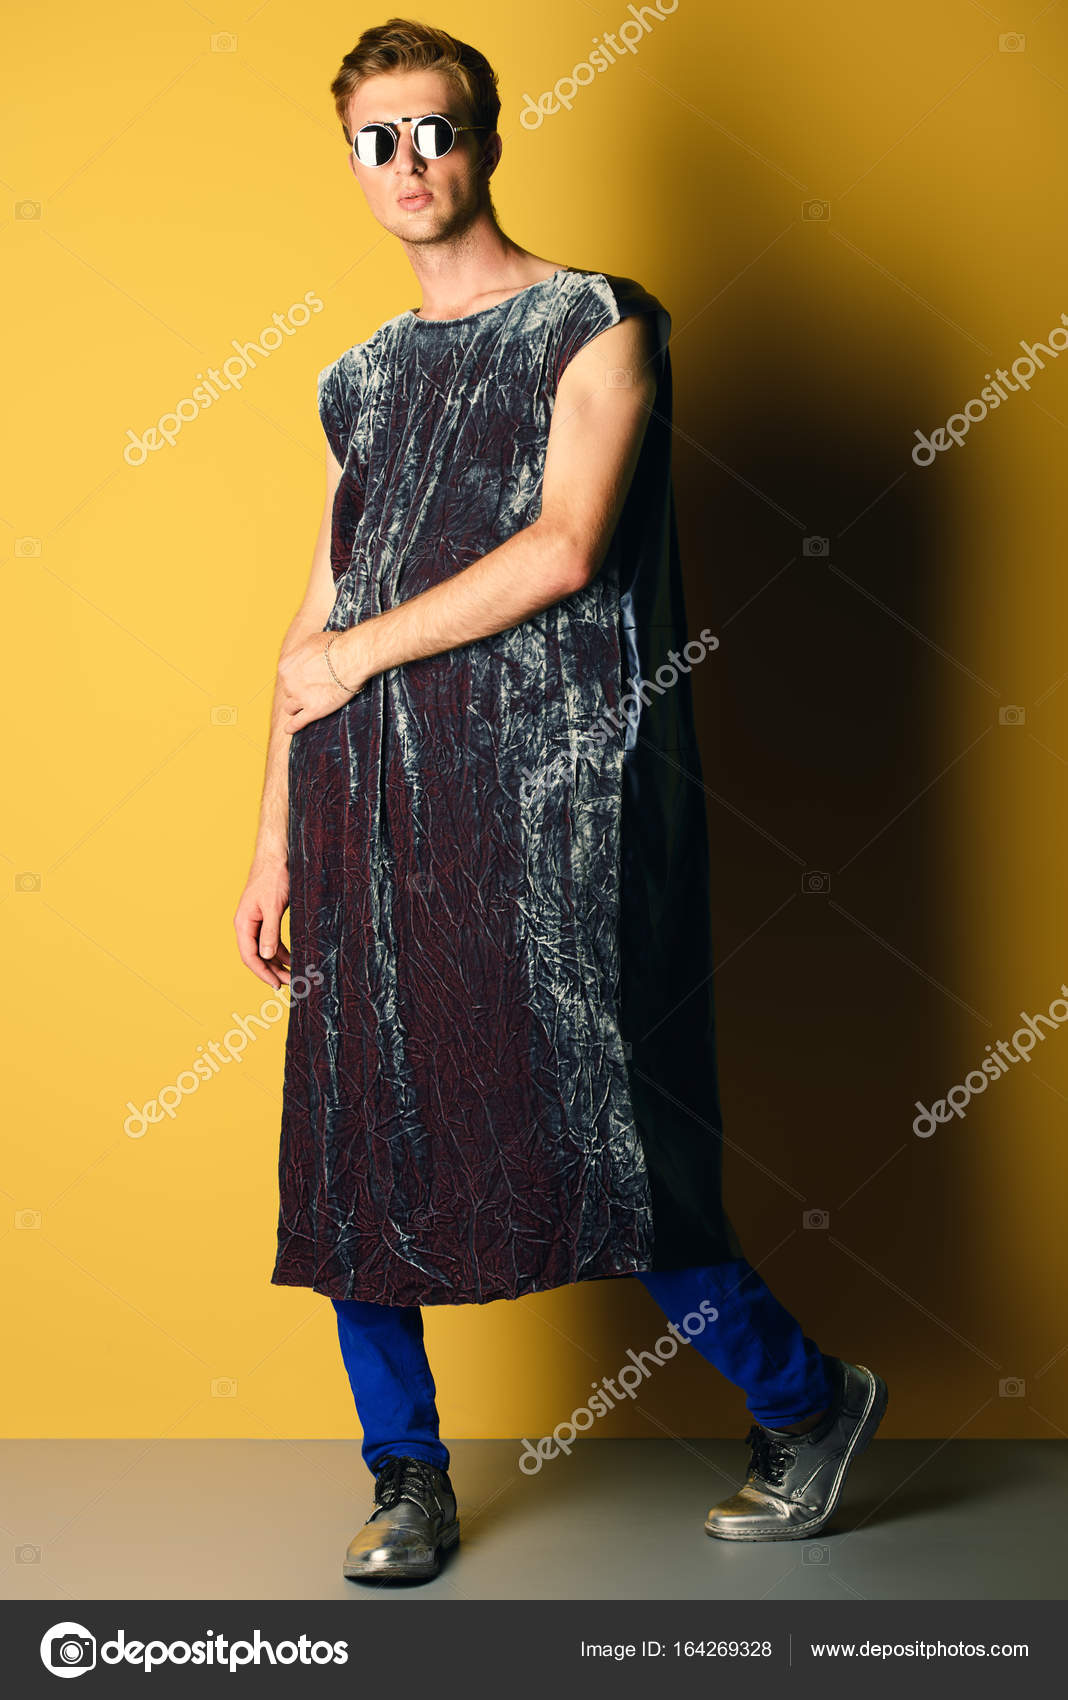 f203240ab4c επώνυμα ρούχα Ανδρικά — Φωτογραφία Αρχείου © prometeus #164269328